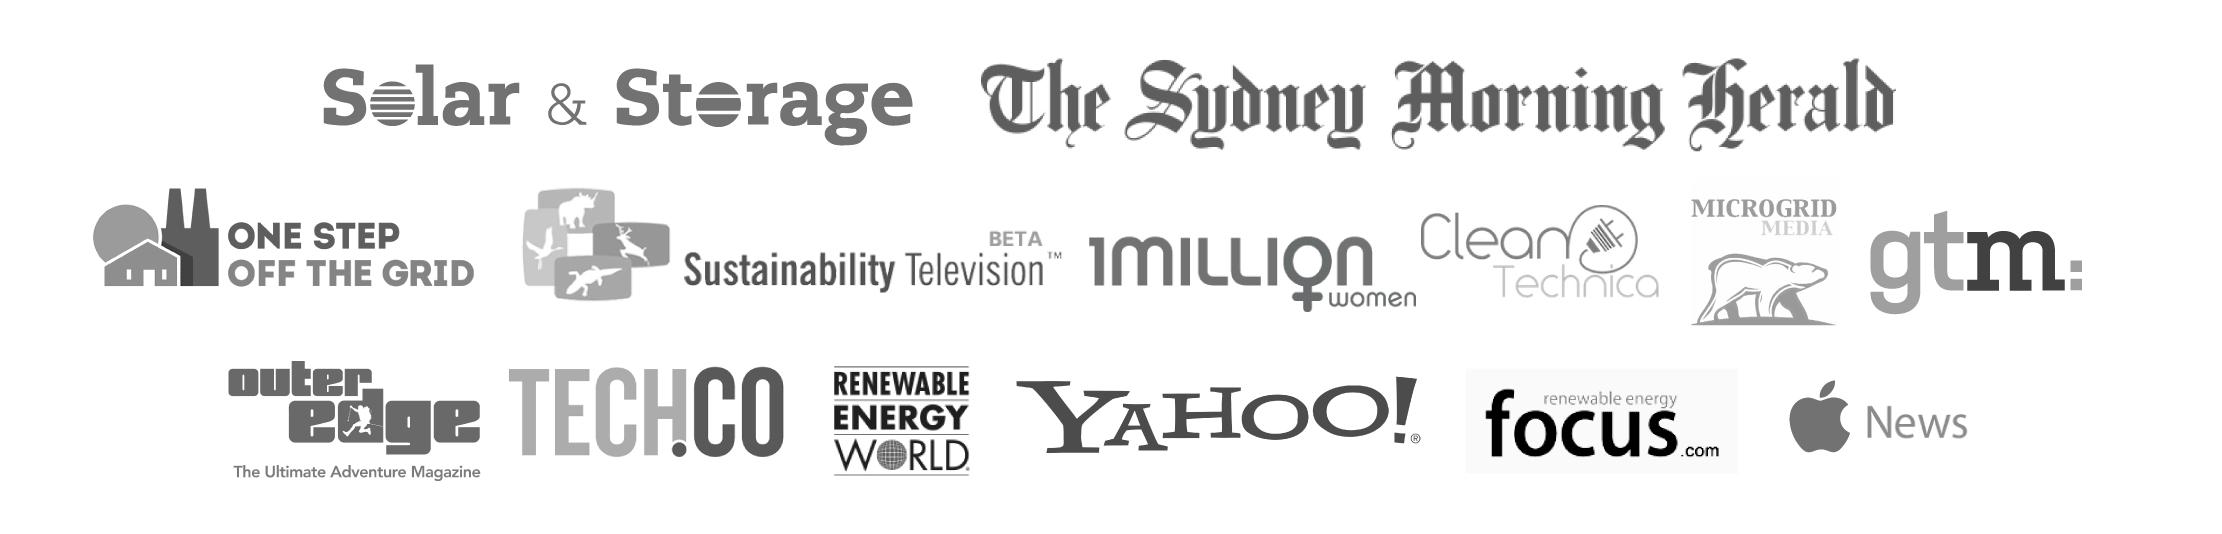 asq solar quotes articles news renewables